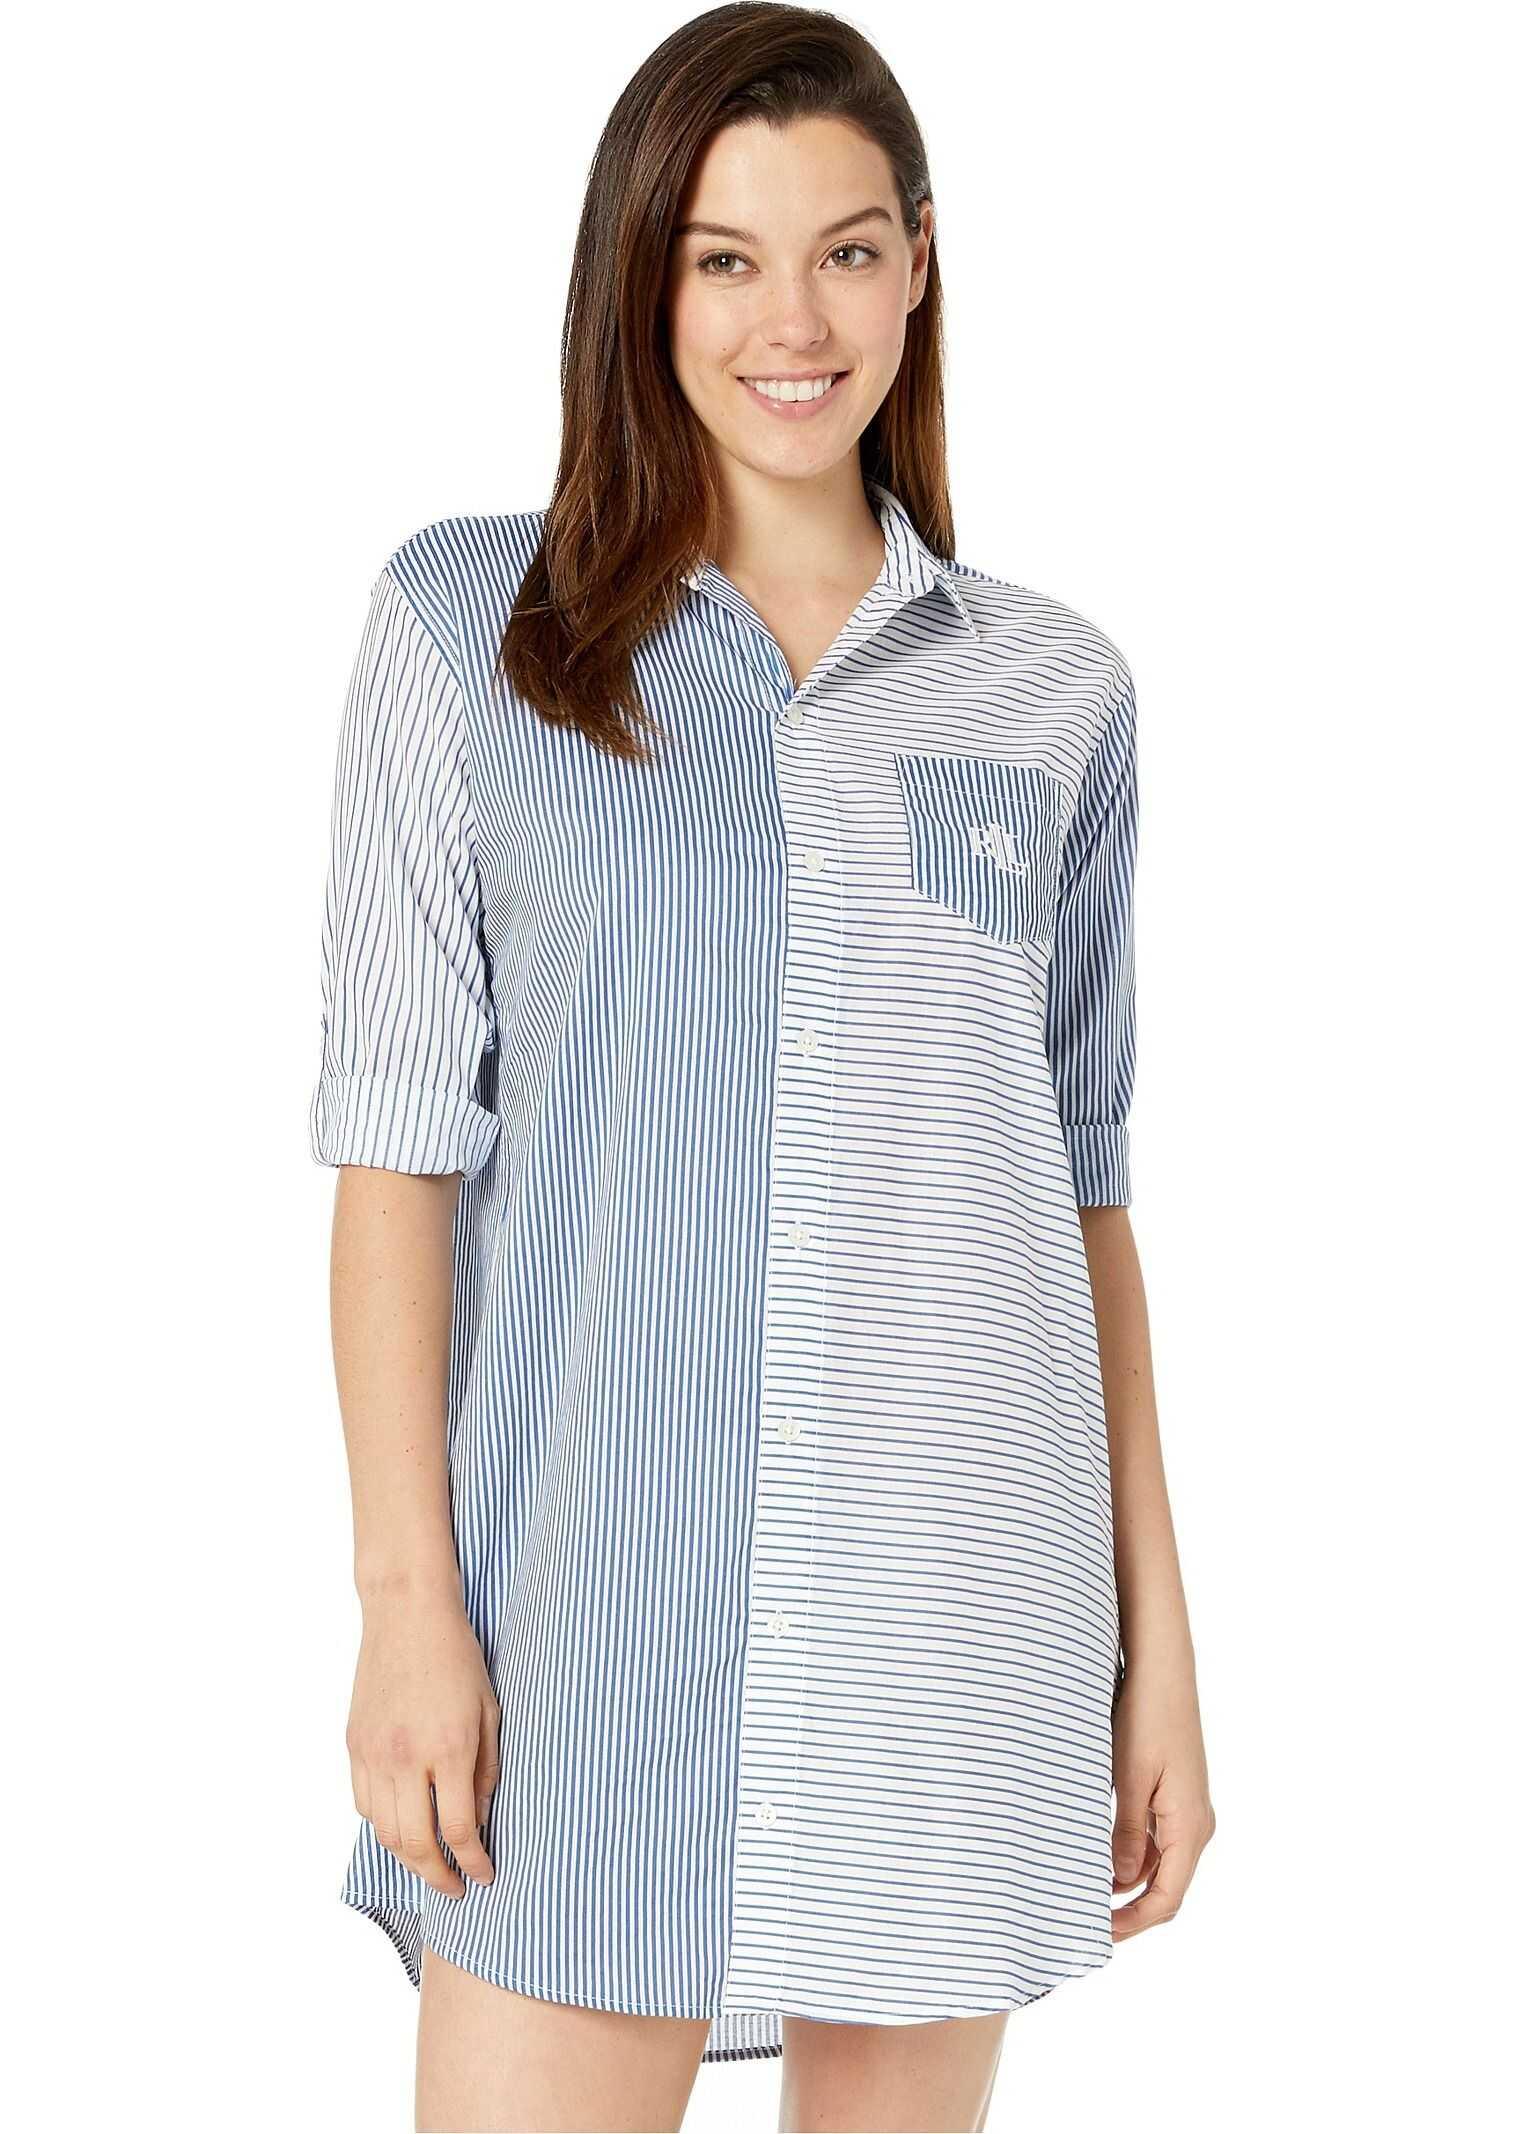 Ralph Lauren 3/4 Sleeve Roll Tab Sleeve His Shirt Sleepshirt Blue Stripe